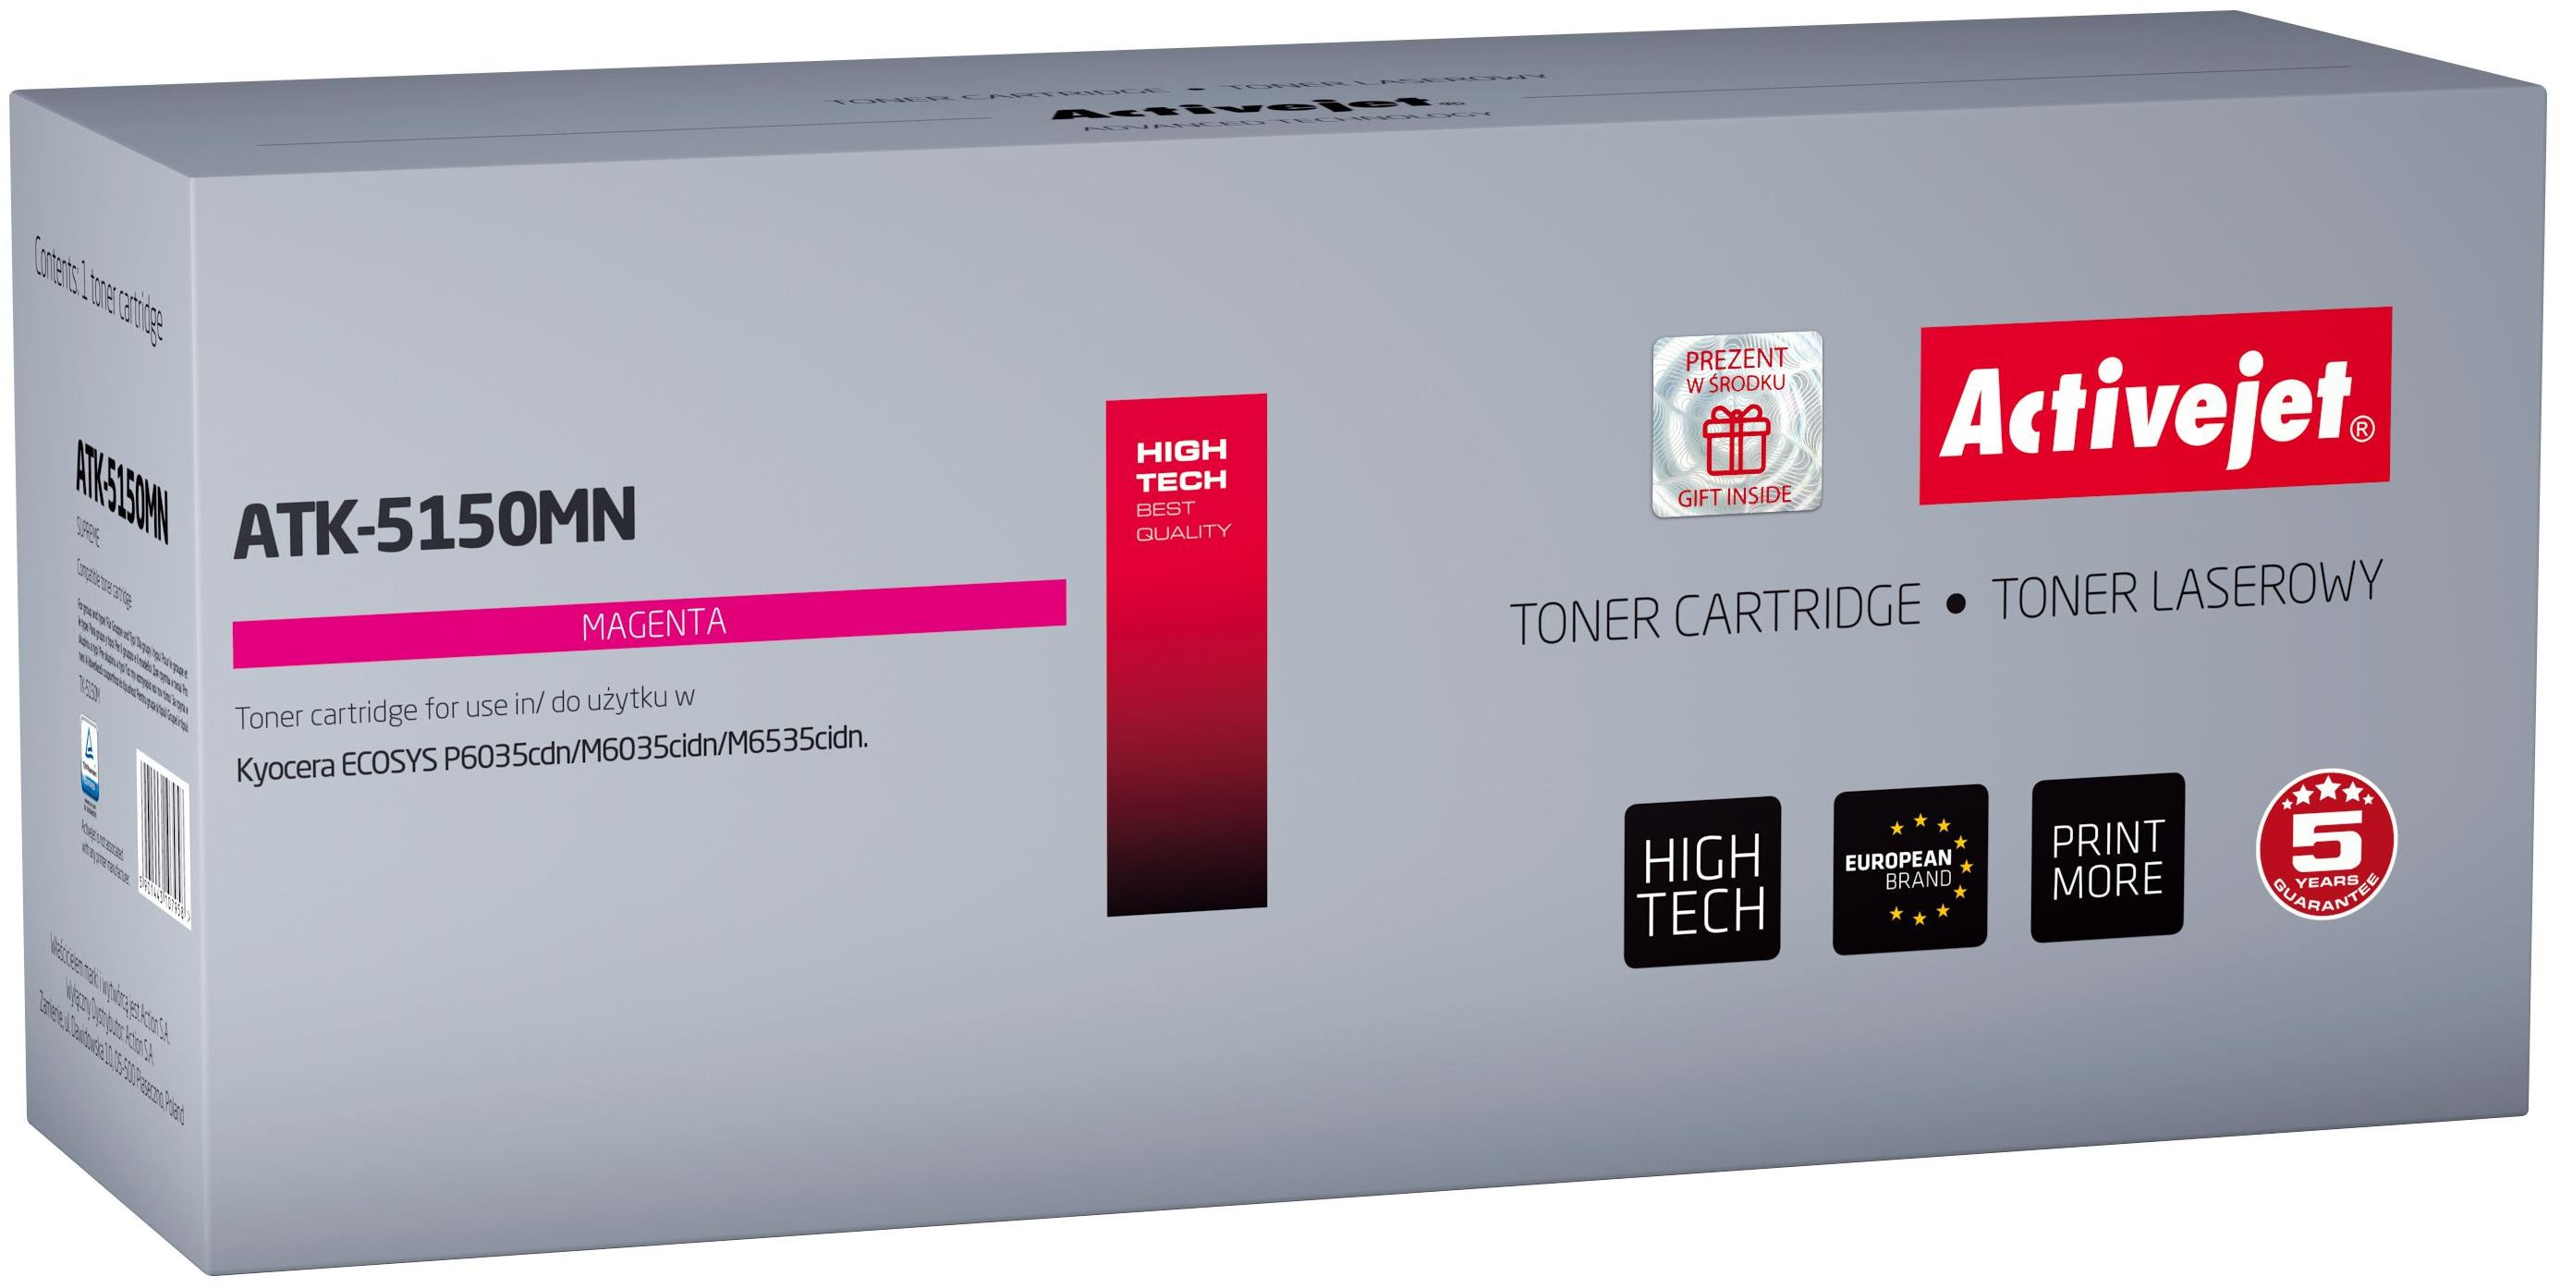 Toner Activejet ATK-5150MN (zamiennik Kyocera TK-5150M; Supreme; 10 000 stron; czerwony)